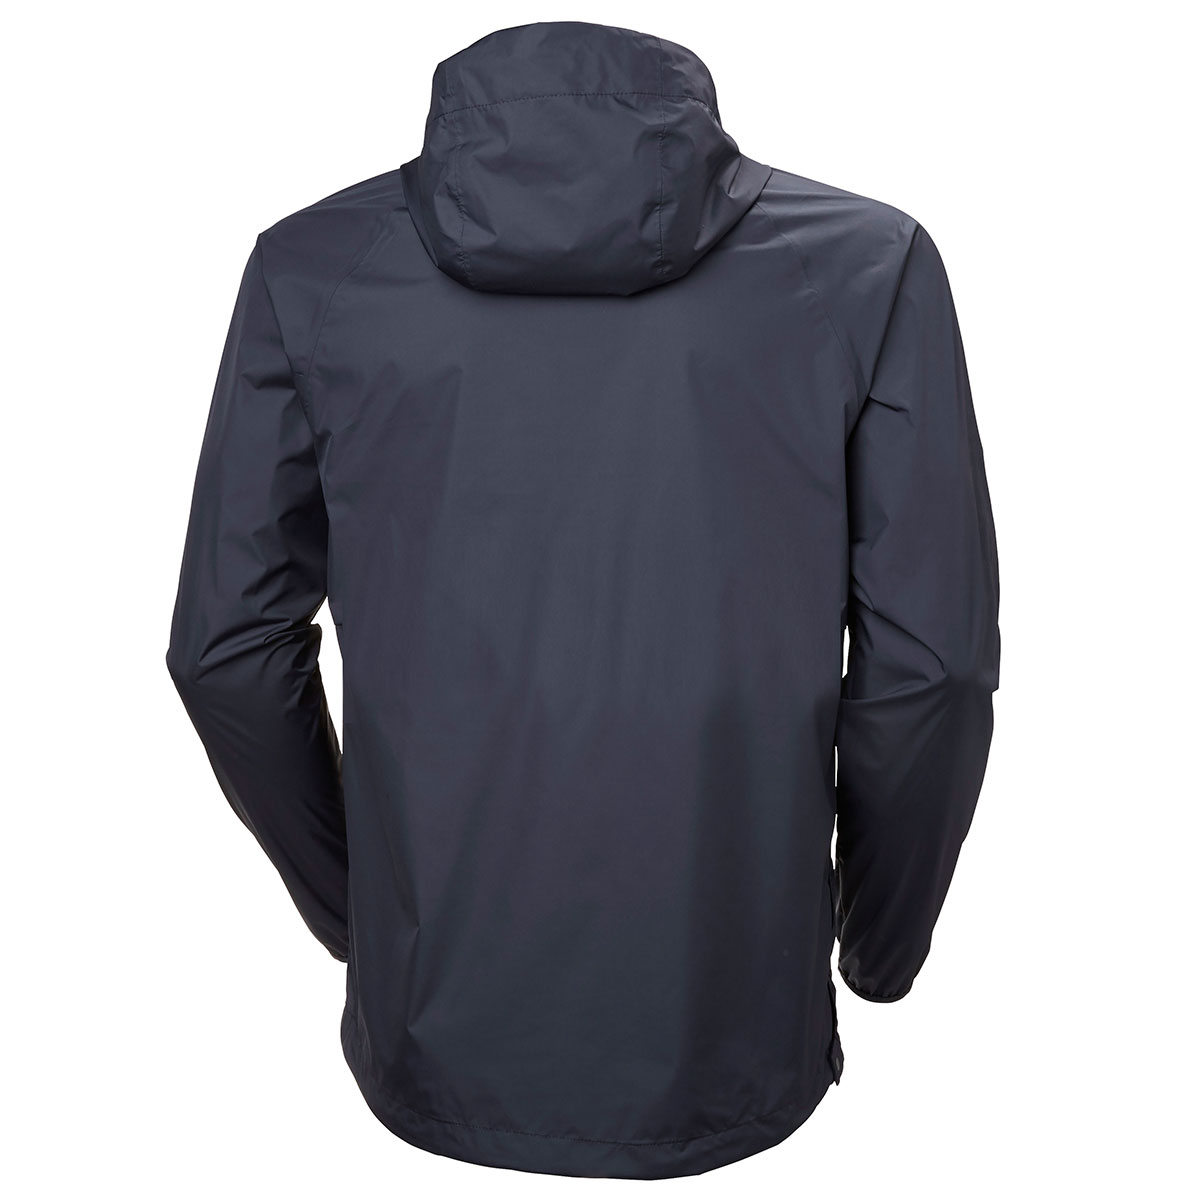 Helly Hansen Mens 2019 Loke Packable Anorak Waterproof Hood Windproof Jacket